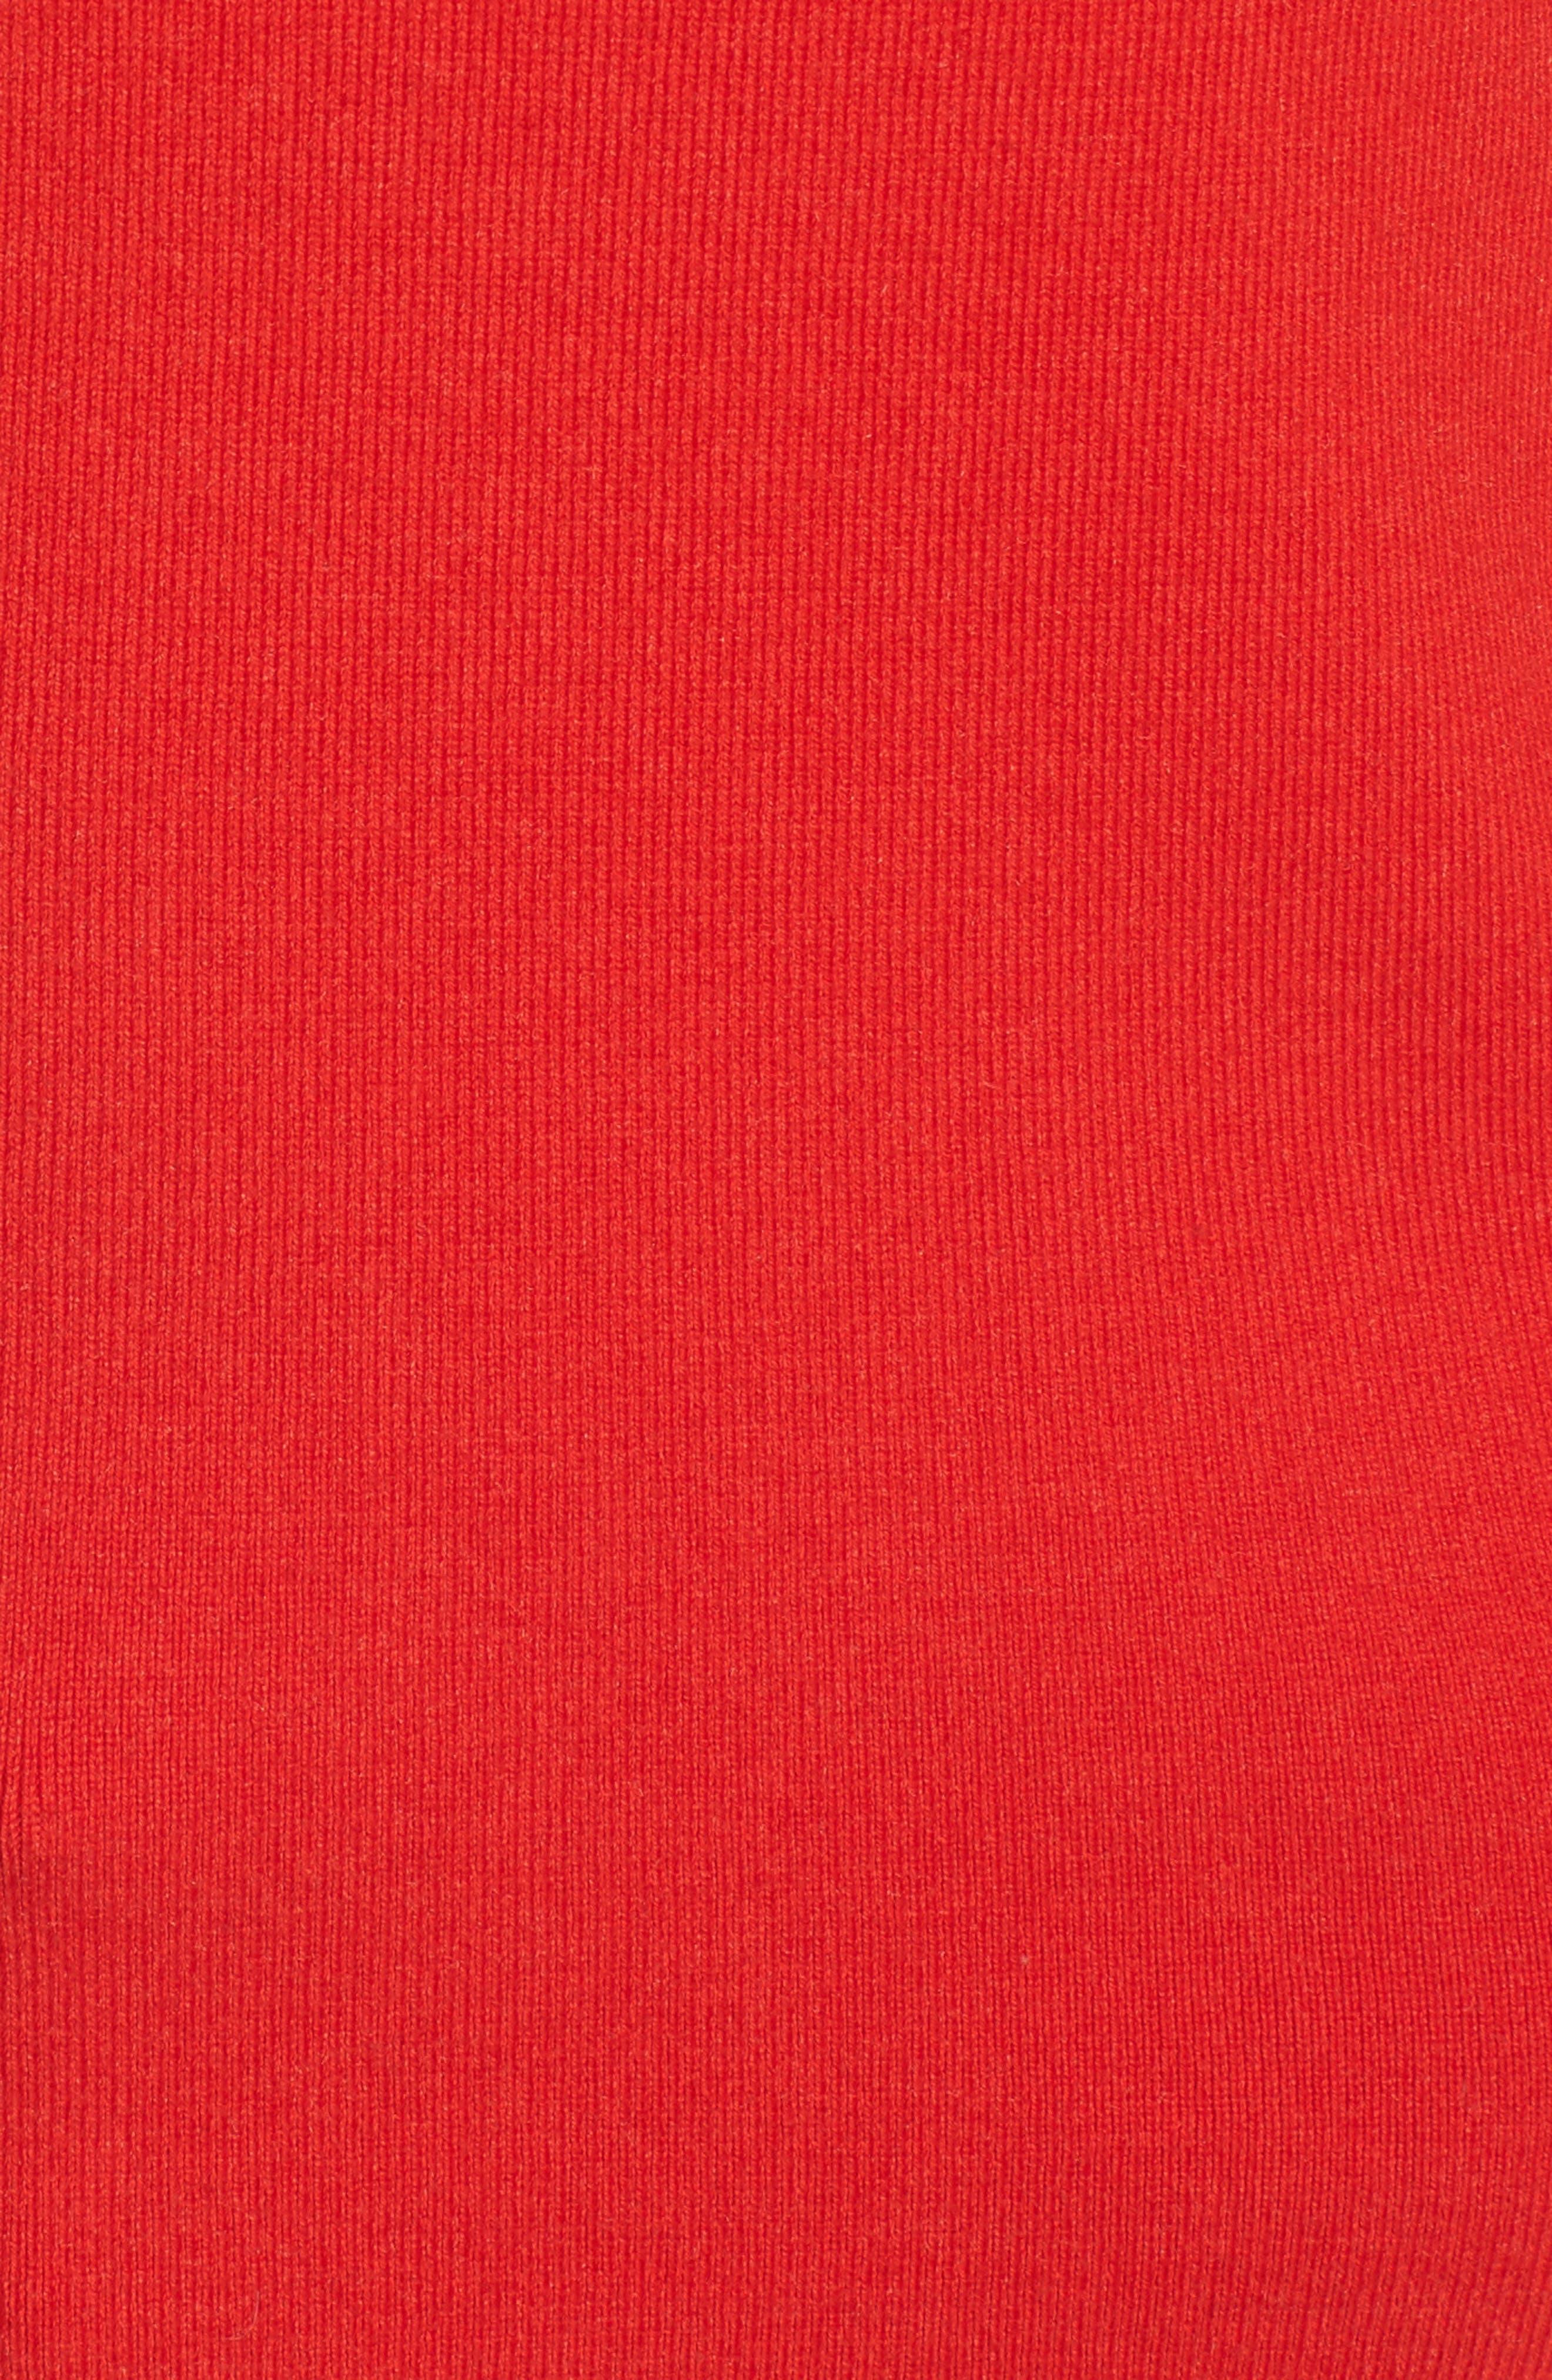 Alternate Image 6  - Halogen Scallop Edge Sweater (Regular & Petite)